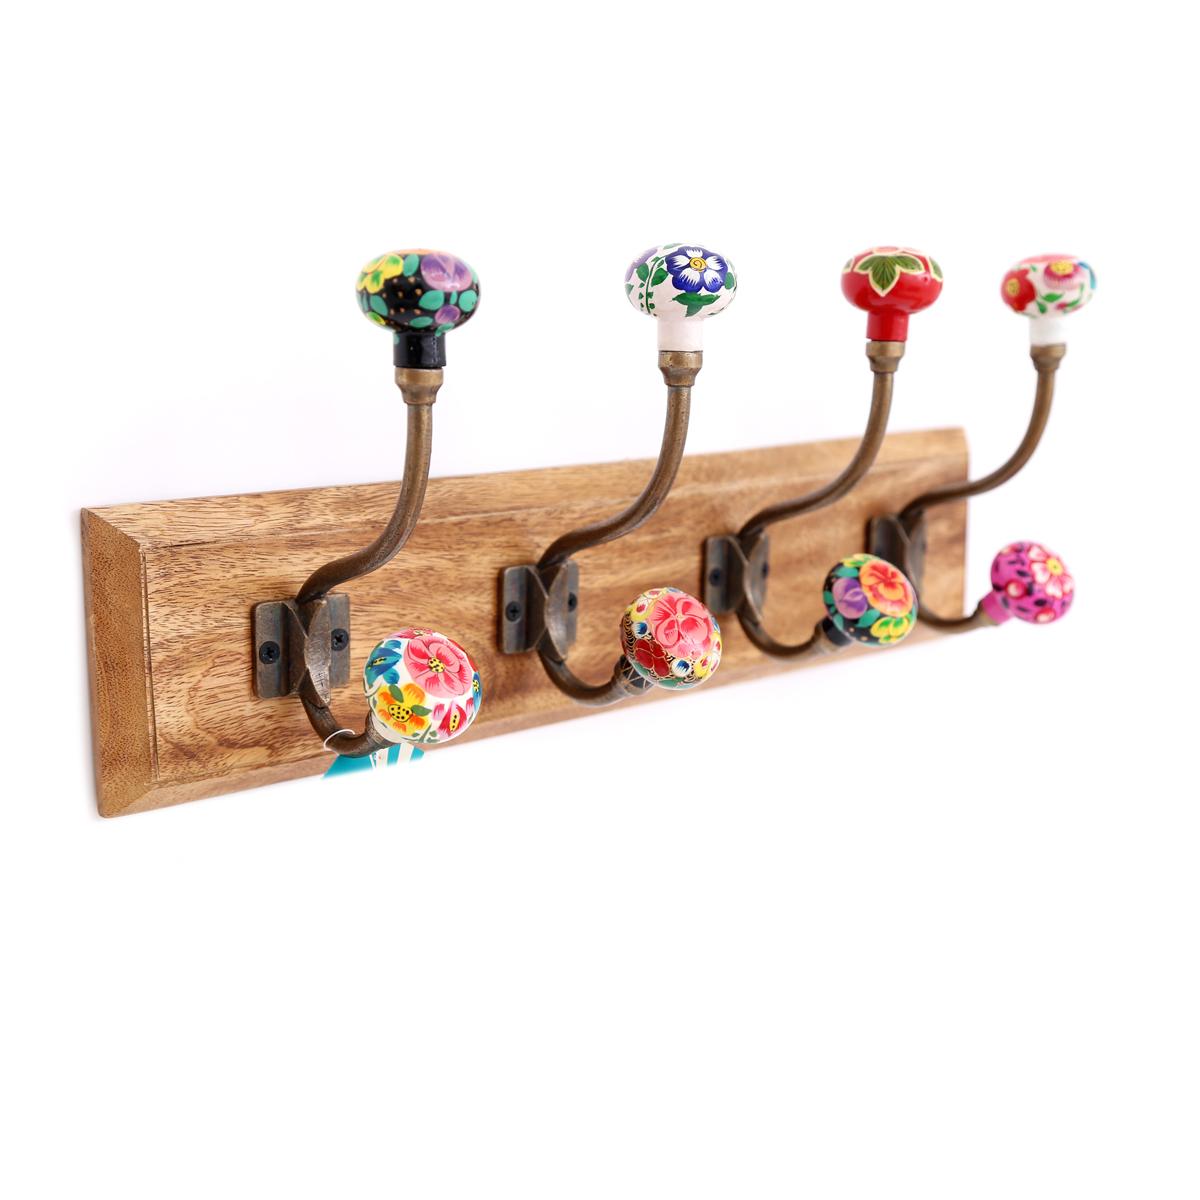 Patère design bois \'Boho\' batik (8 têtes) - 44x16x8 cm - [A0619]